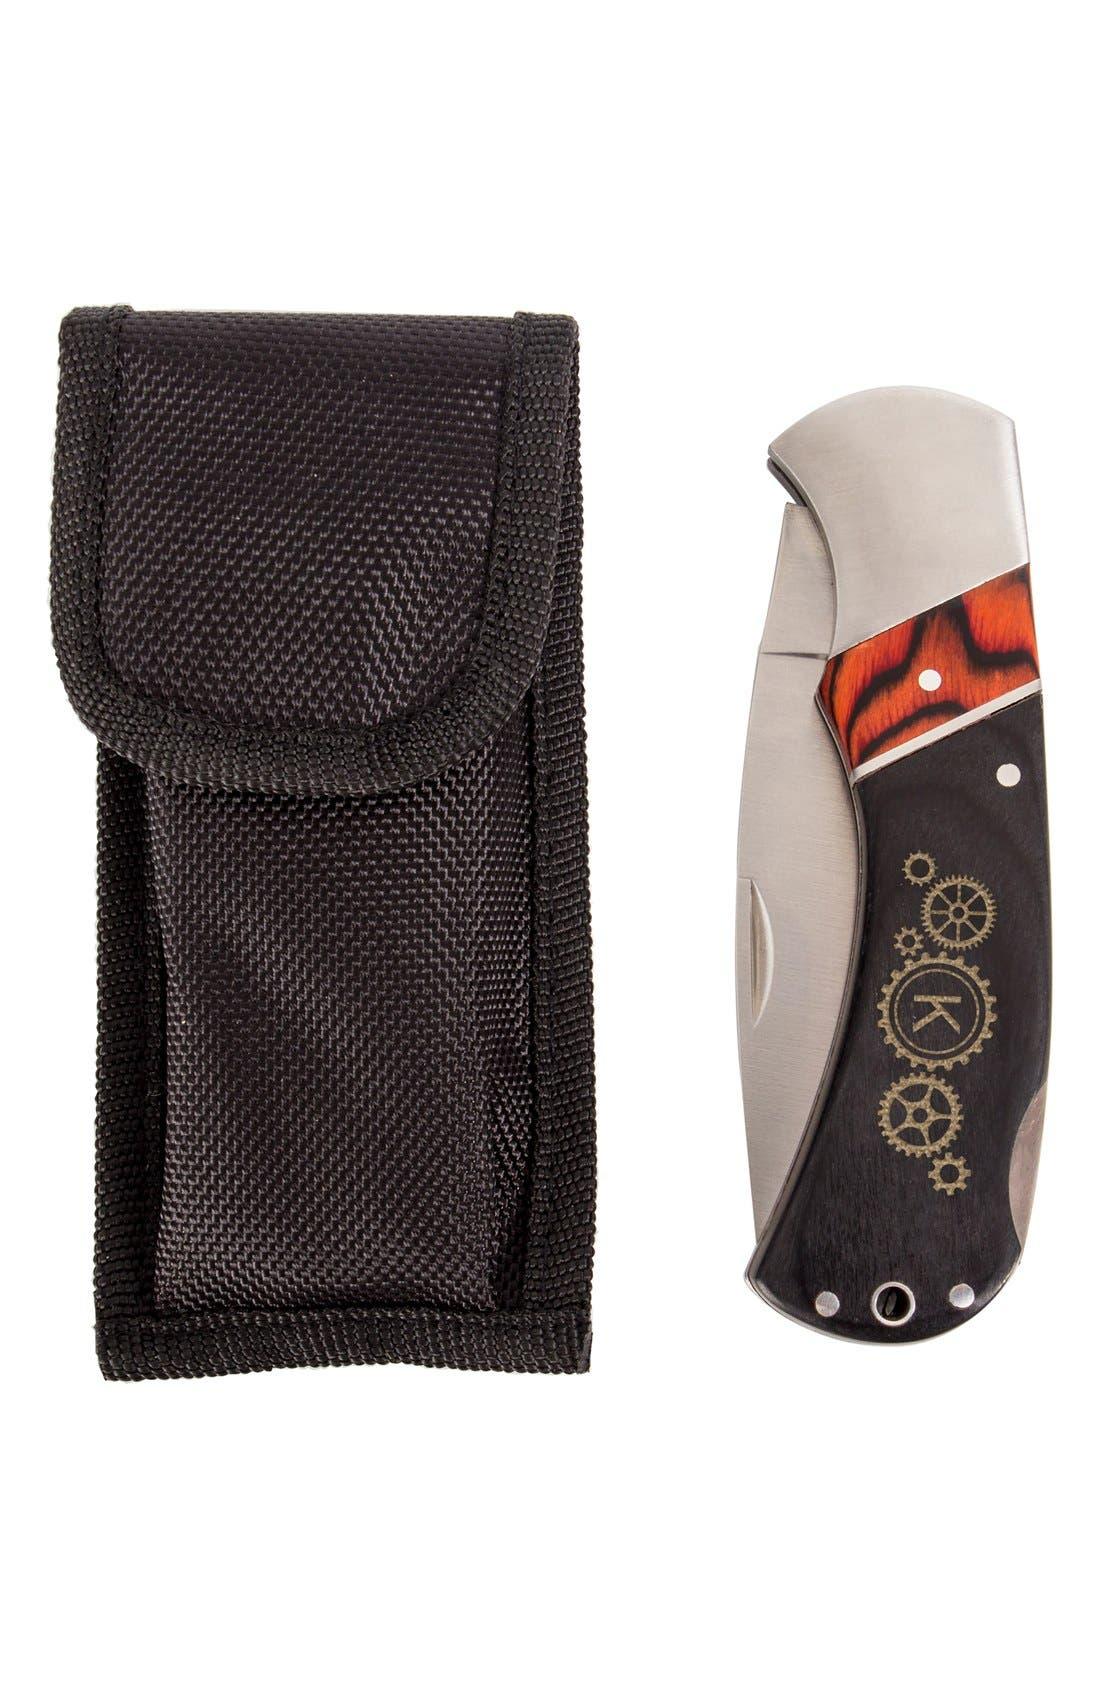 Steampunk Monogram Folding Stainless Steel Pocket Knife,                             Alternate thumbnail 53, color,